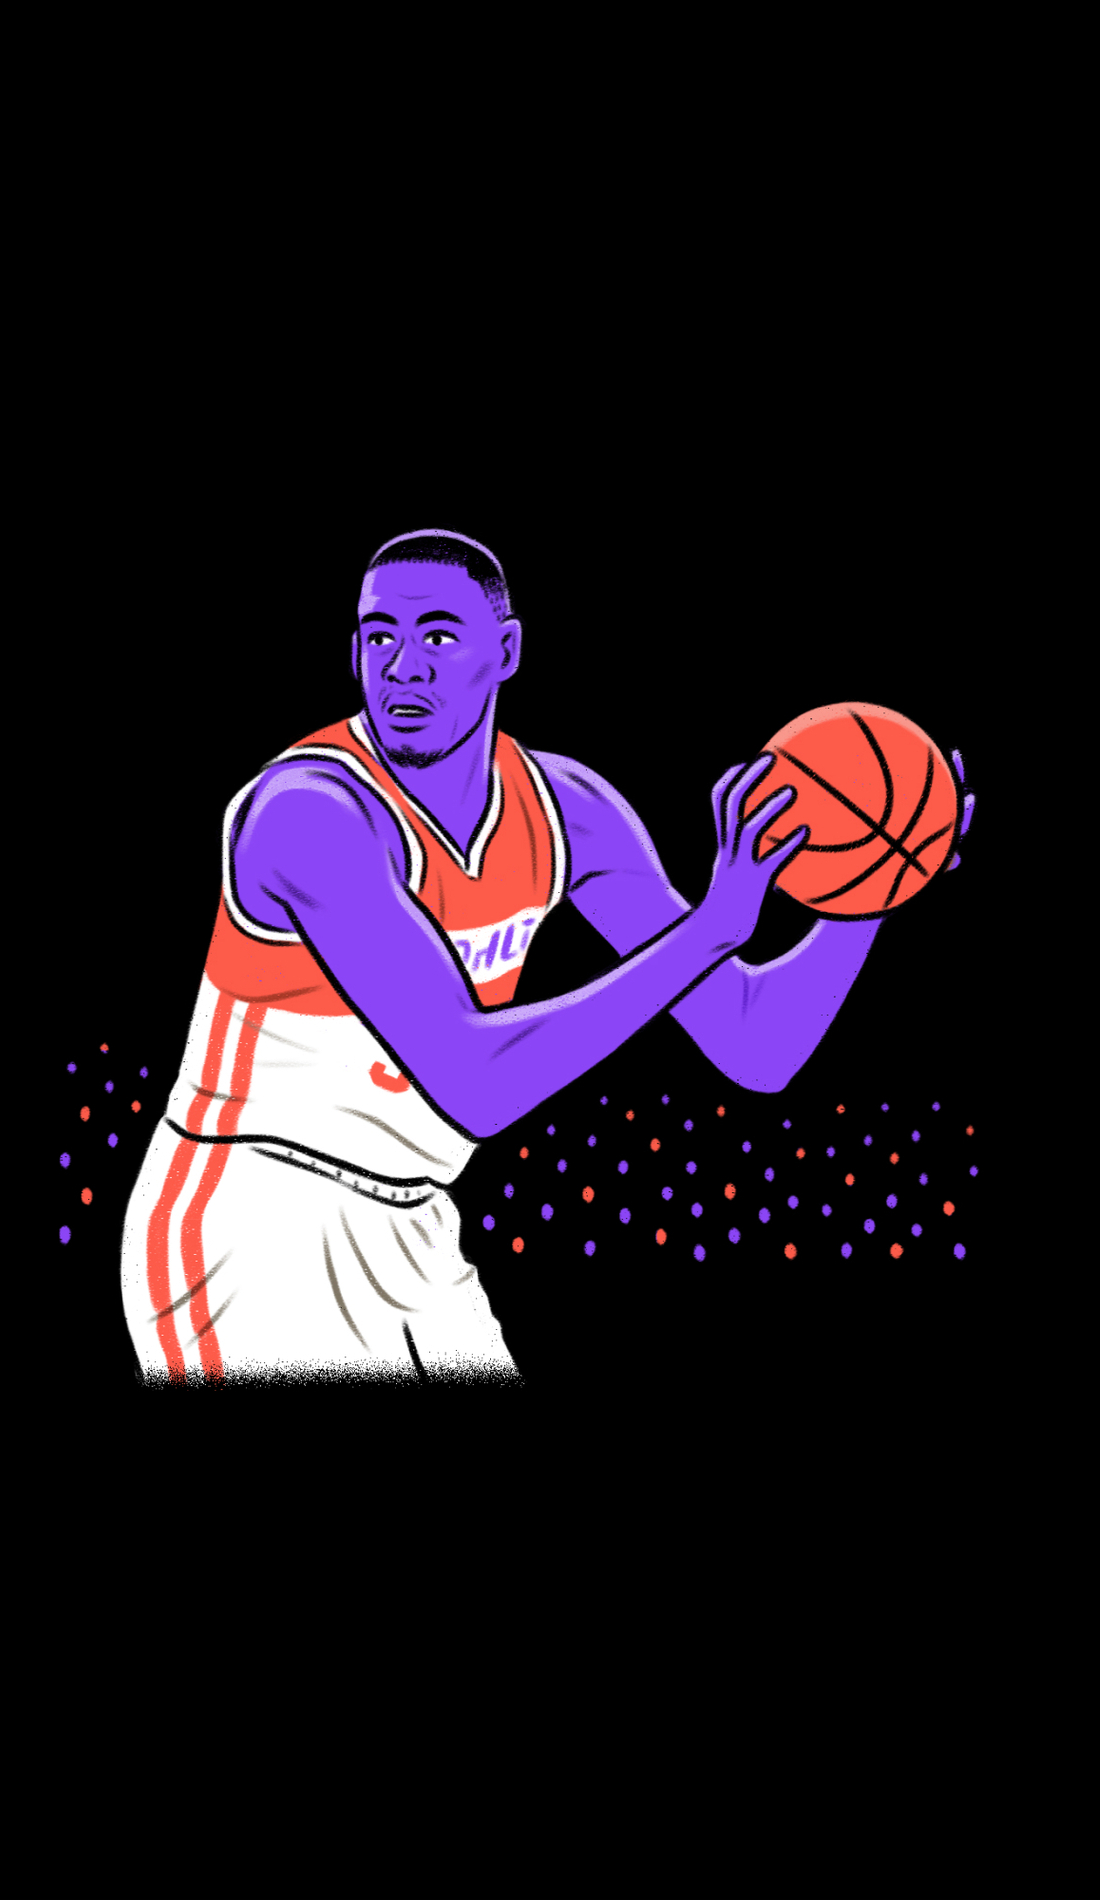 A Howard Bison Basketball live event